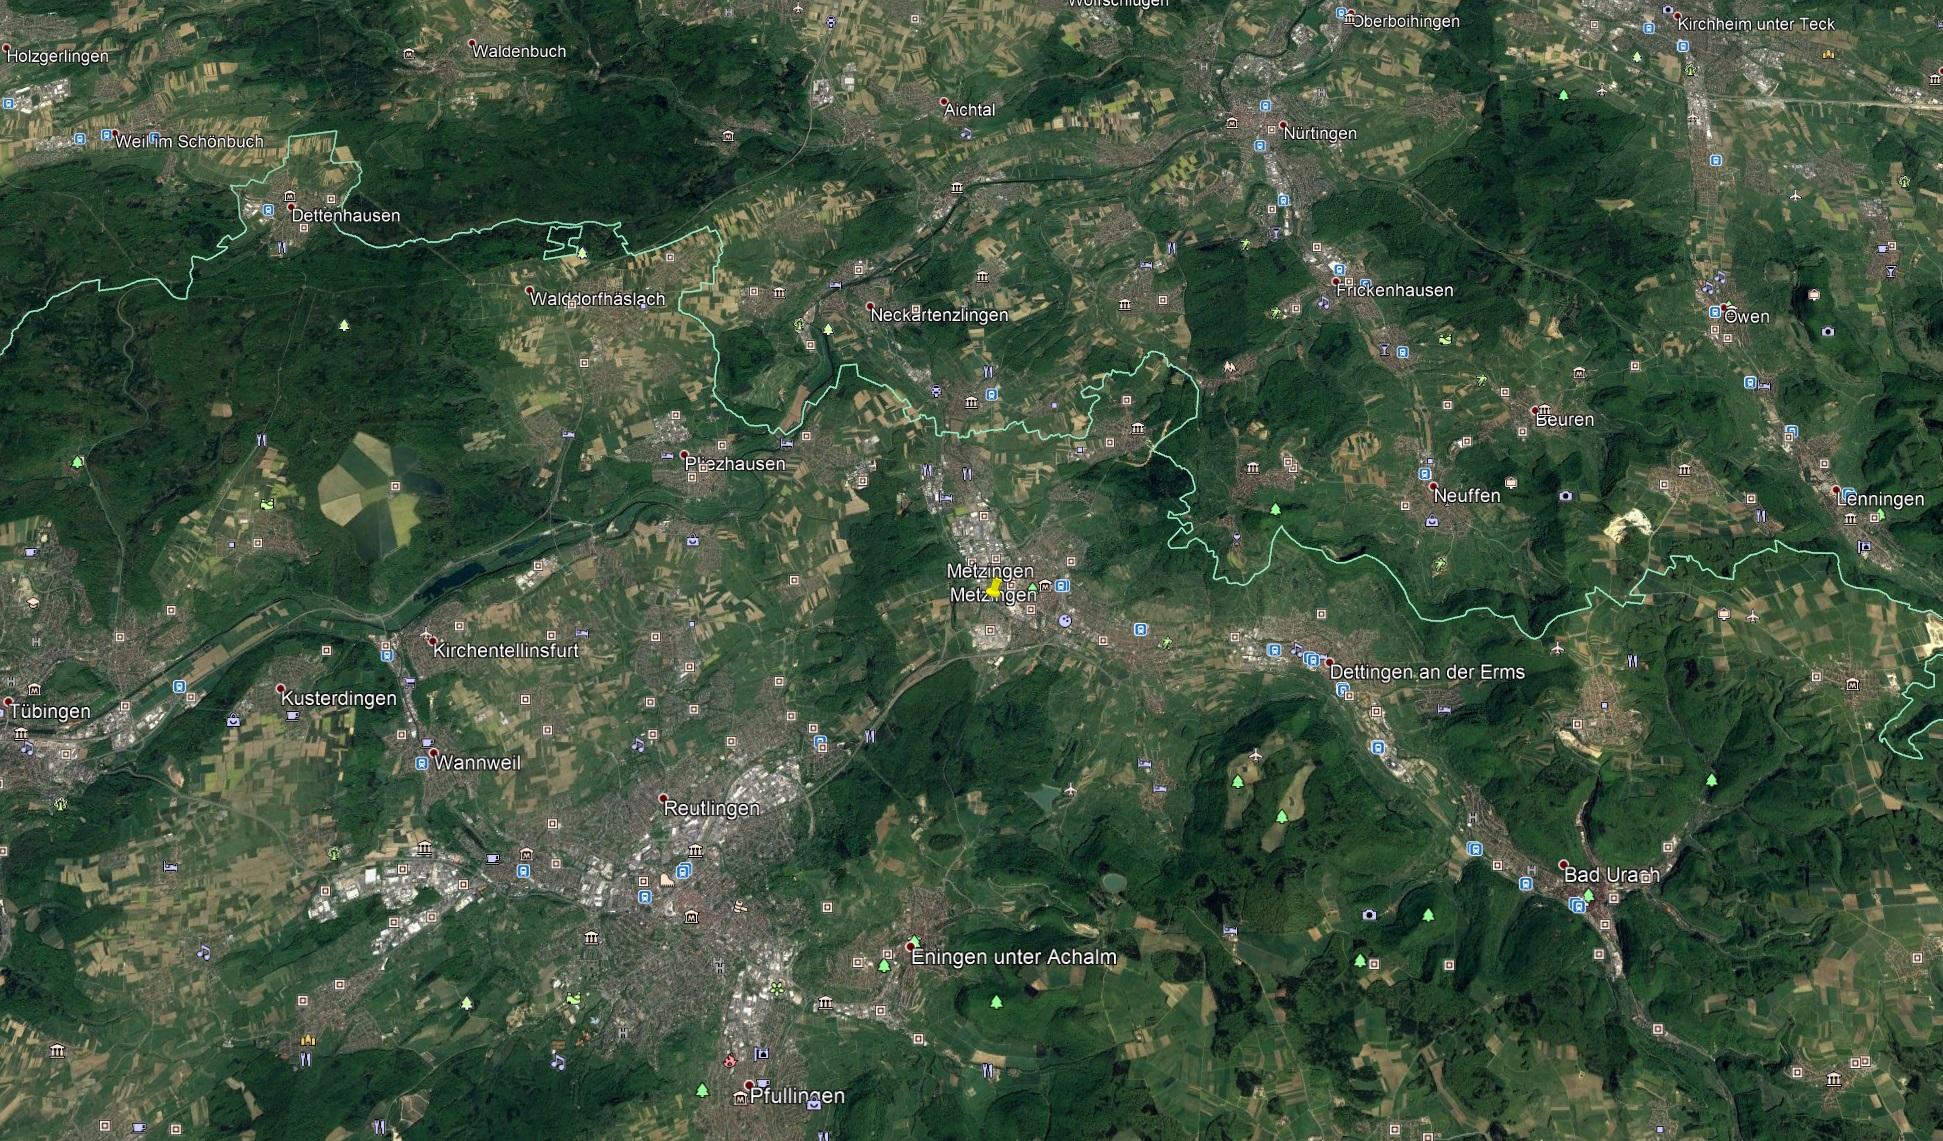 http://www.wetterstation-leutenbach.de/Bilder/metzingen0_1.jpg